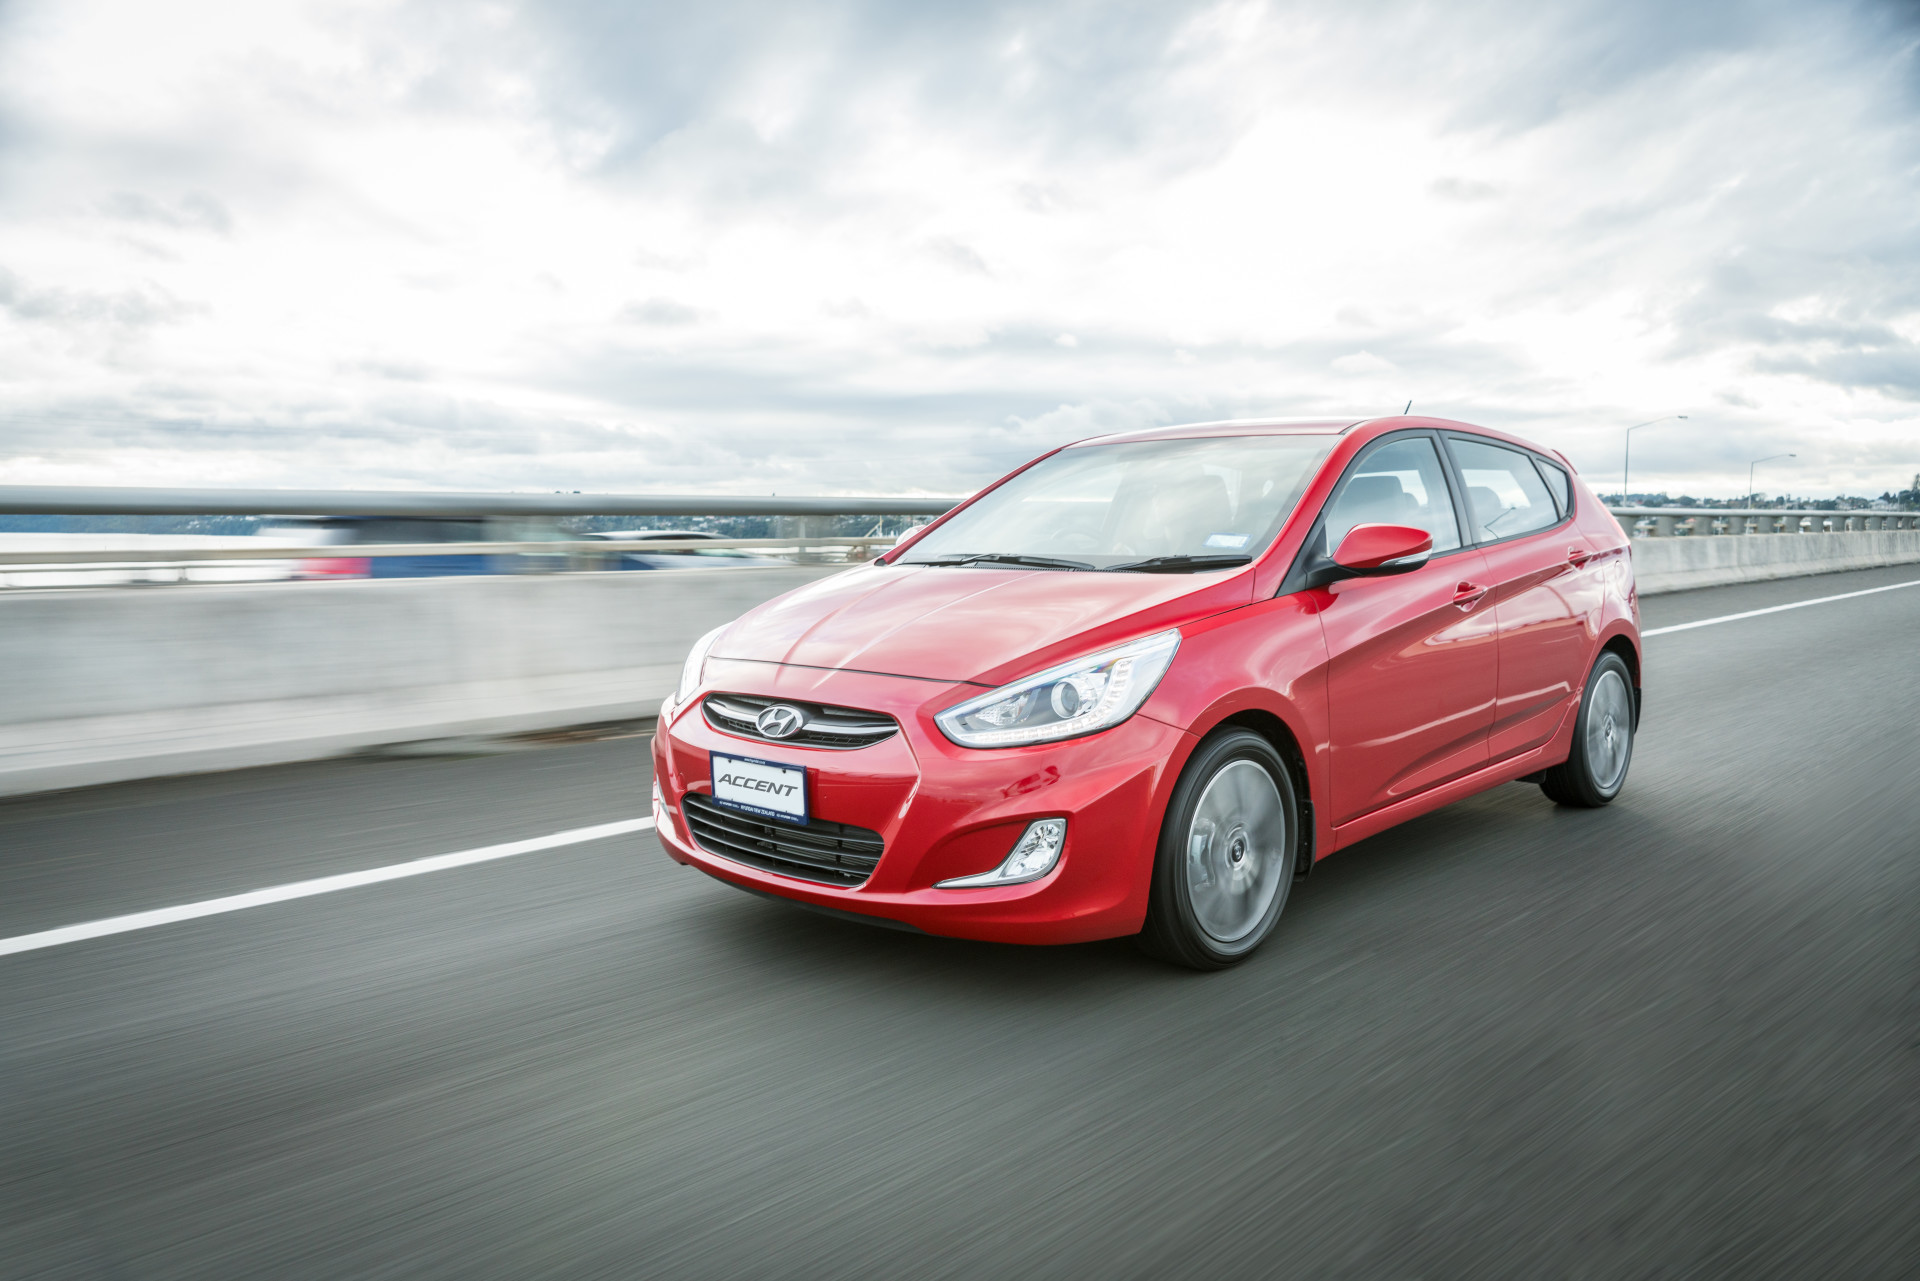 Accent Hatch Hyundai New Zealand